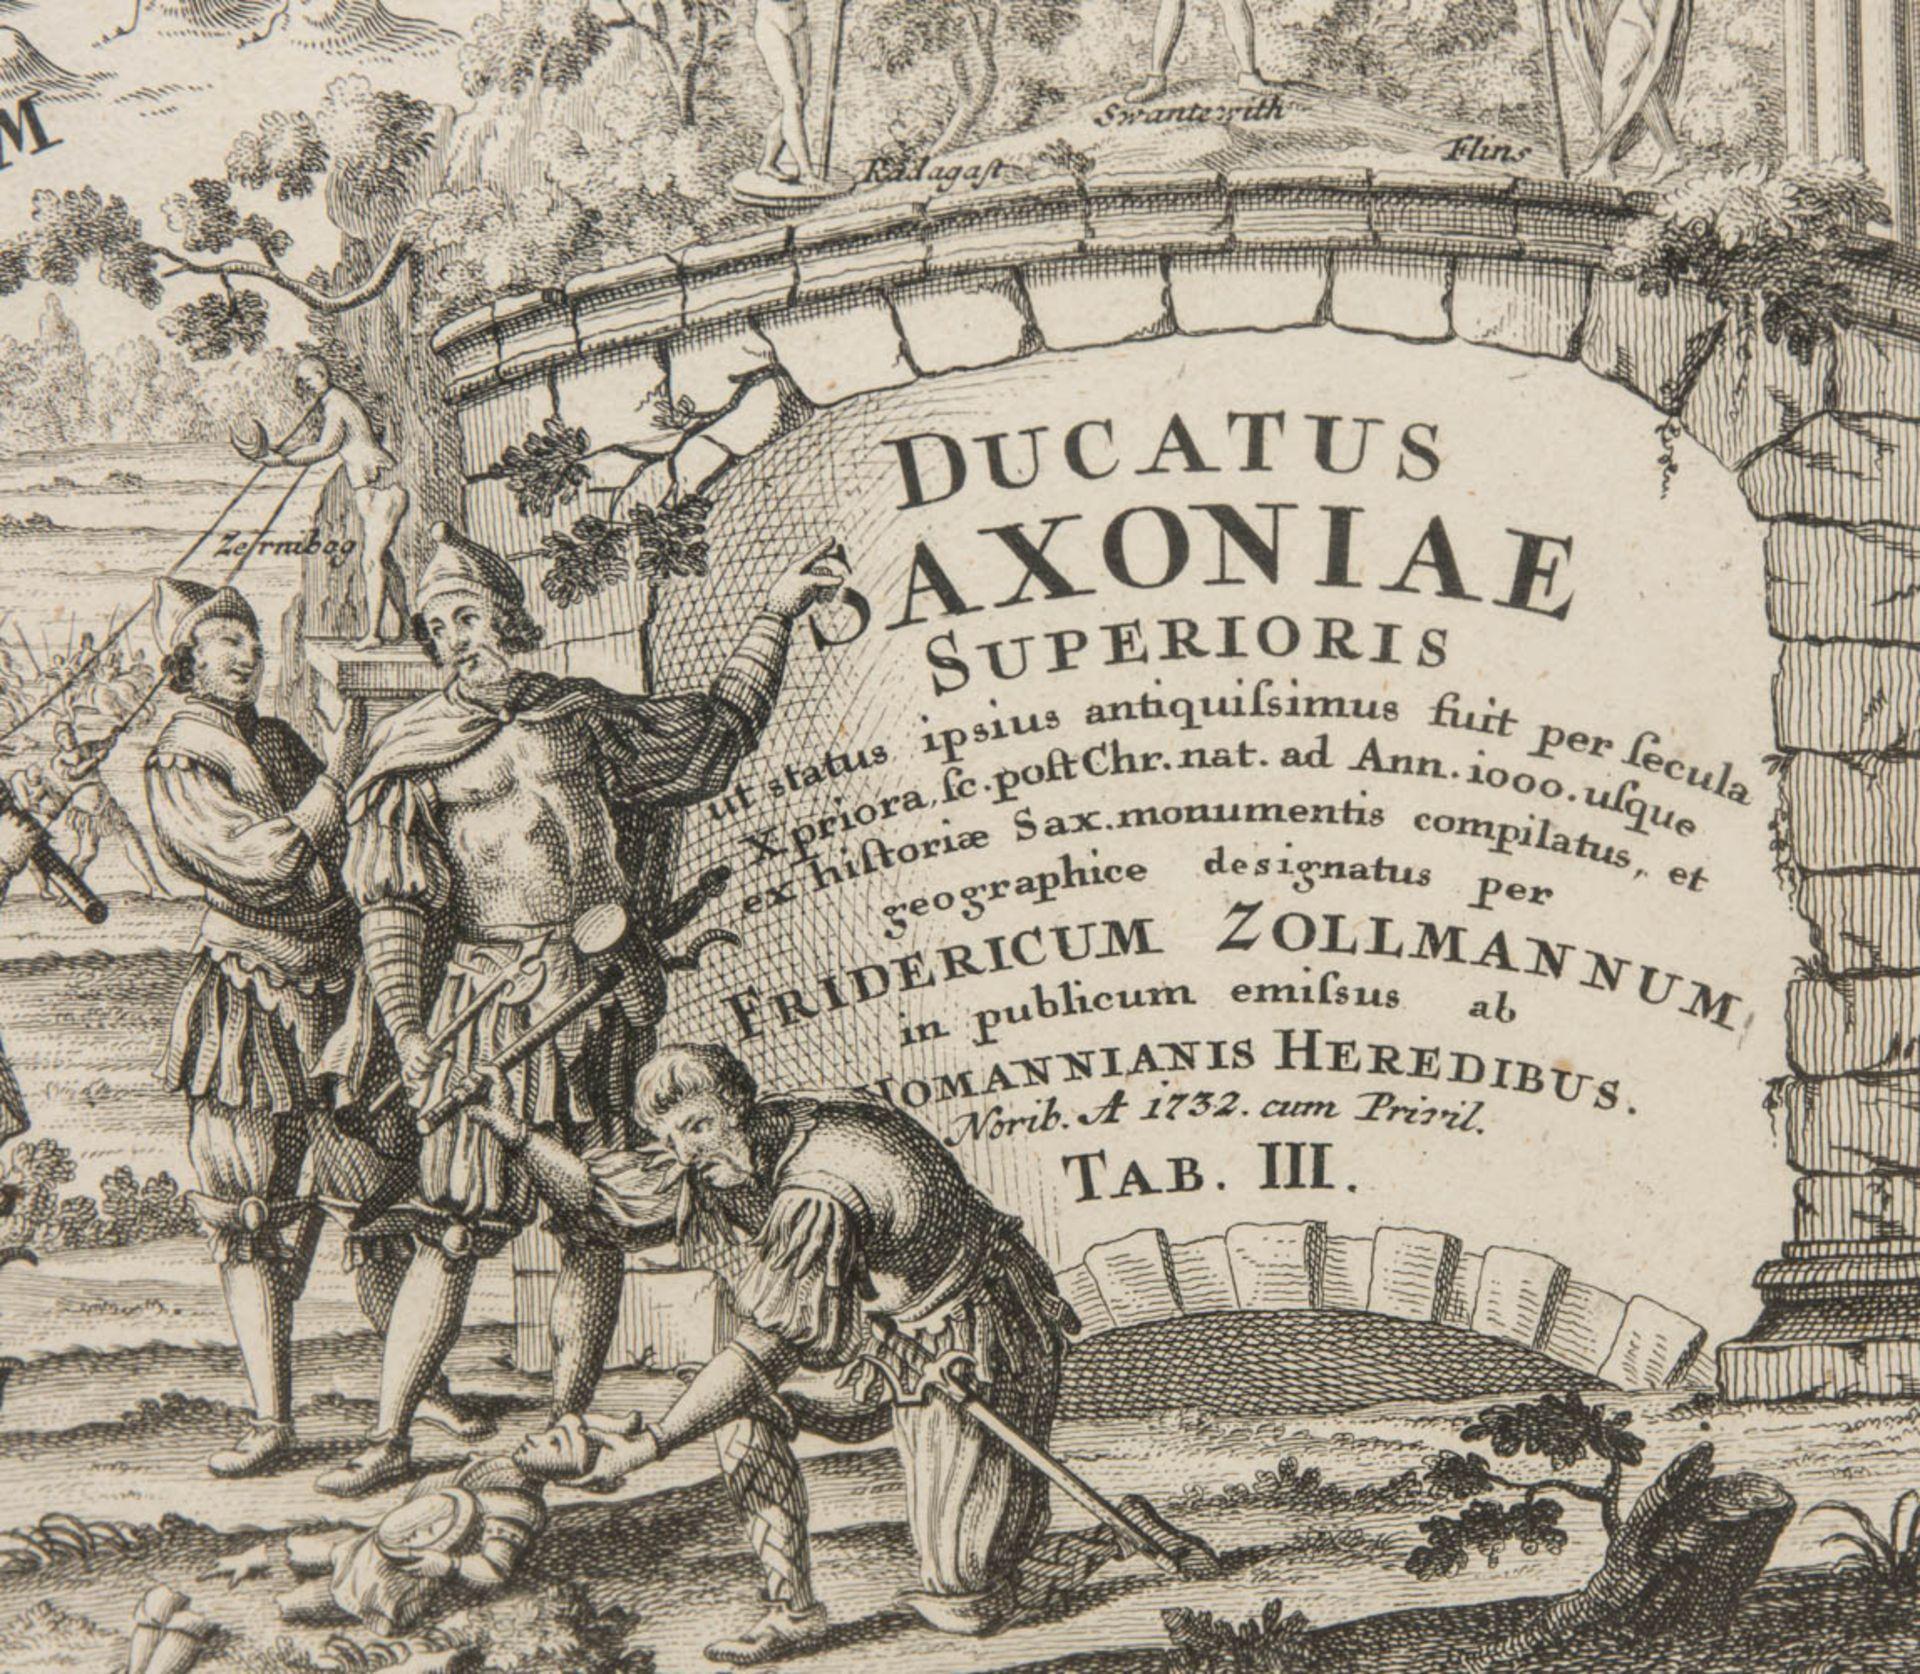 Ducatus Saxoniae, Antike Landkarte des Frankenreiches.Hinter Glas gerahmt. 65 - Bild 2 aus 4